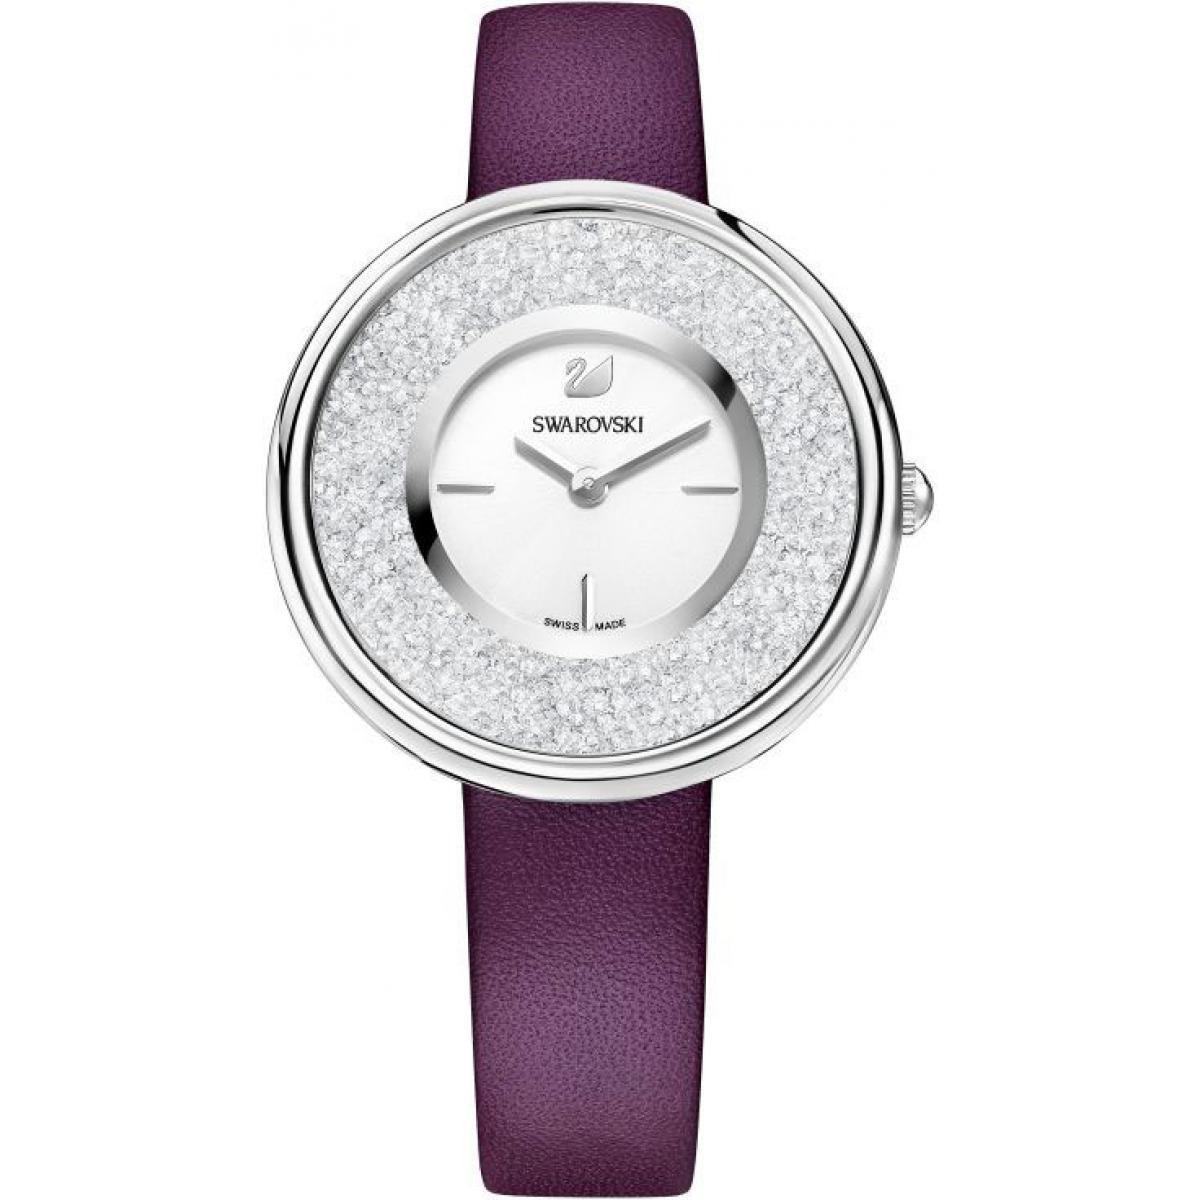 Montre Swarovski 5295355 - Montre Cristaux Swarovski Cuir Bordeaux - Swarovski montres - Modalova